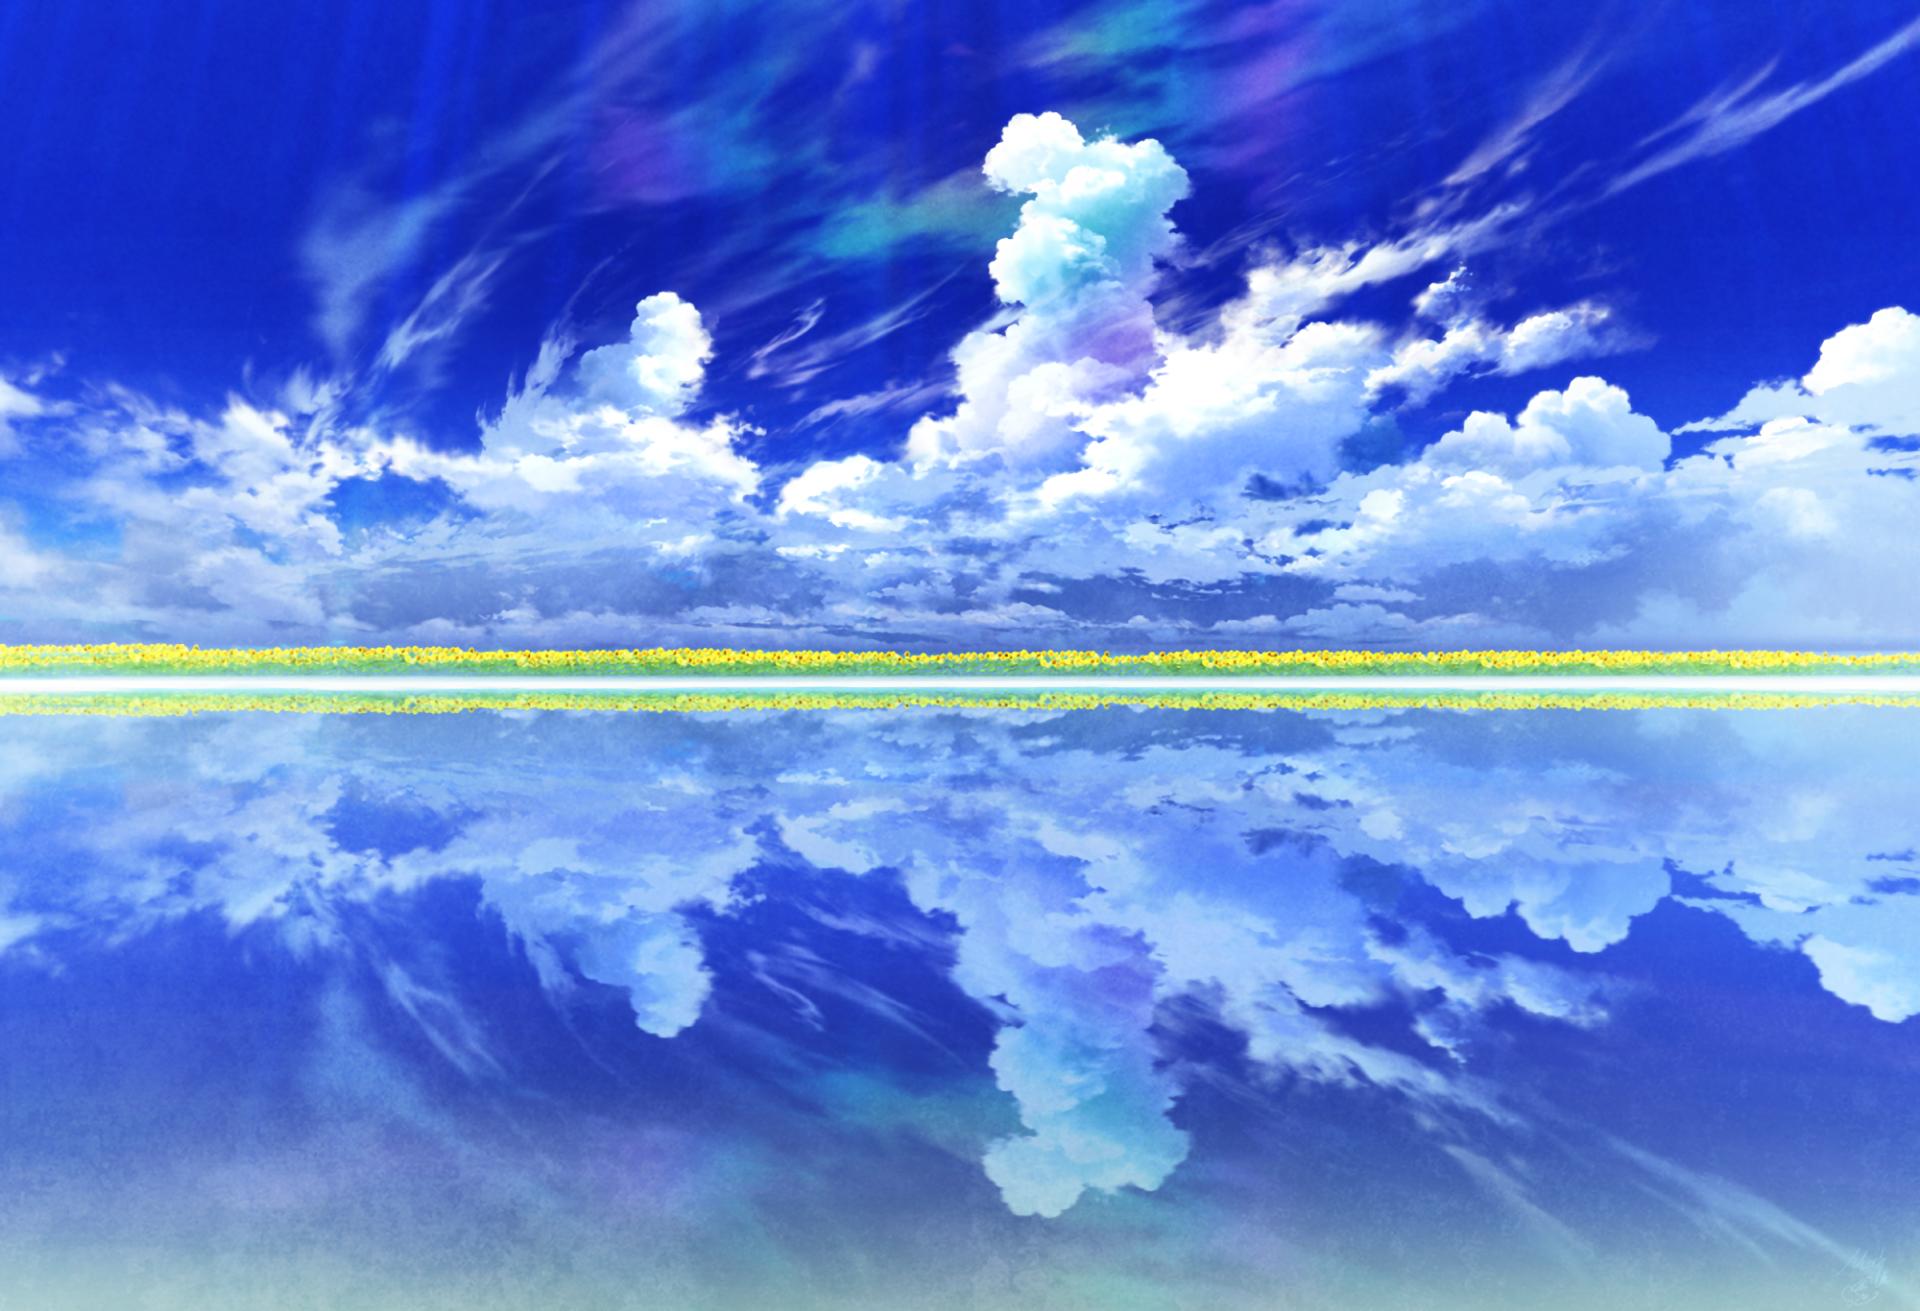 Original hd wallpaper background image 2000x1366 id - Anime sky background ...